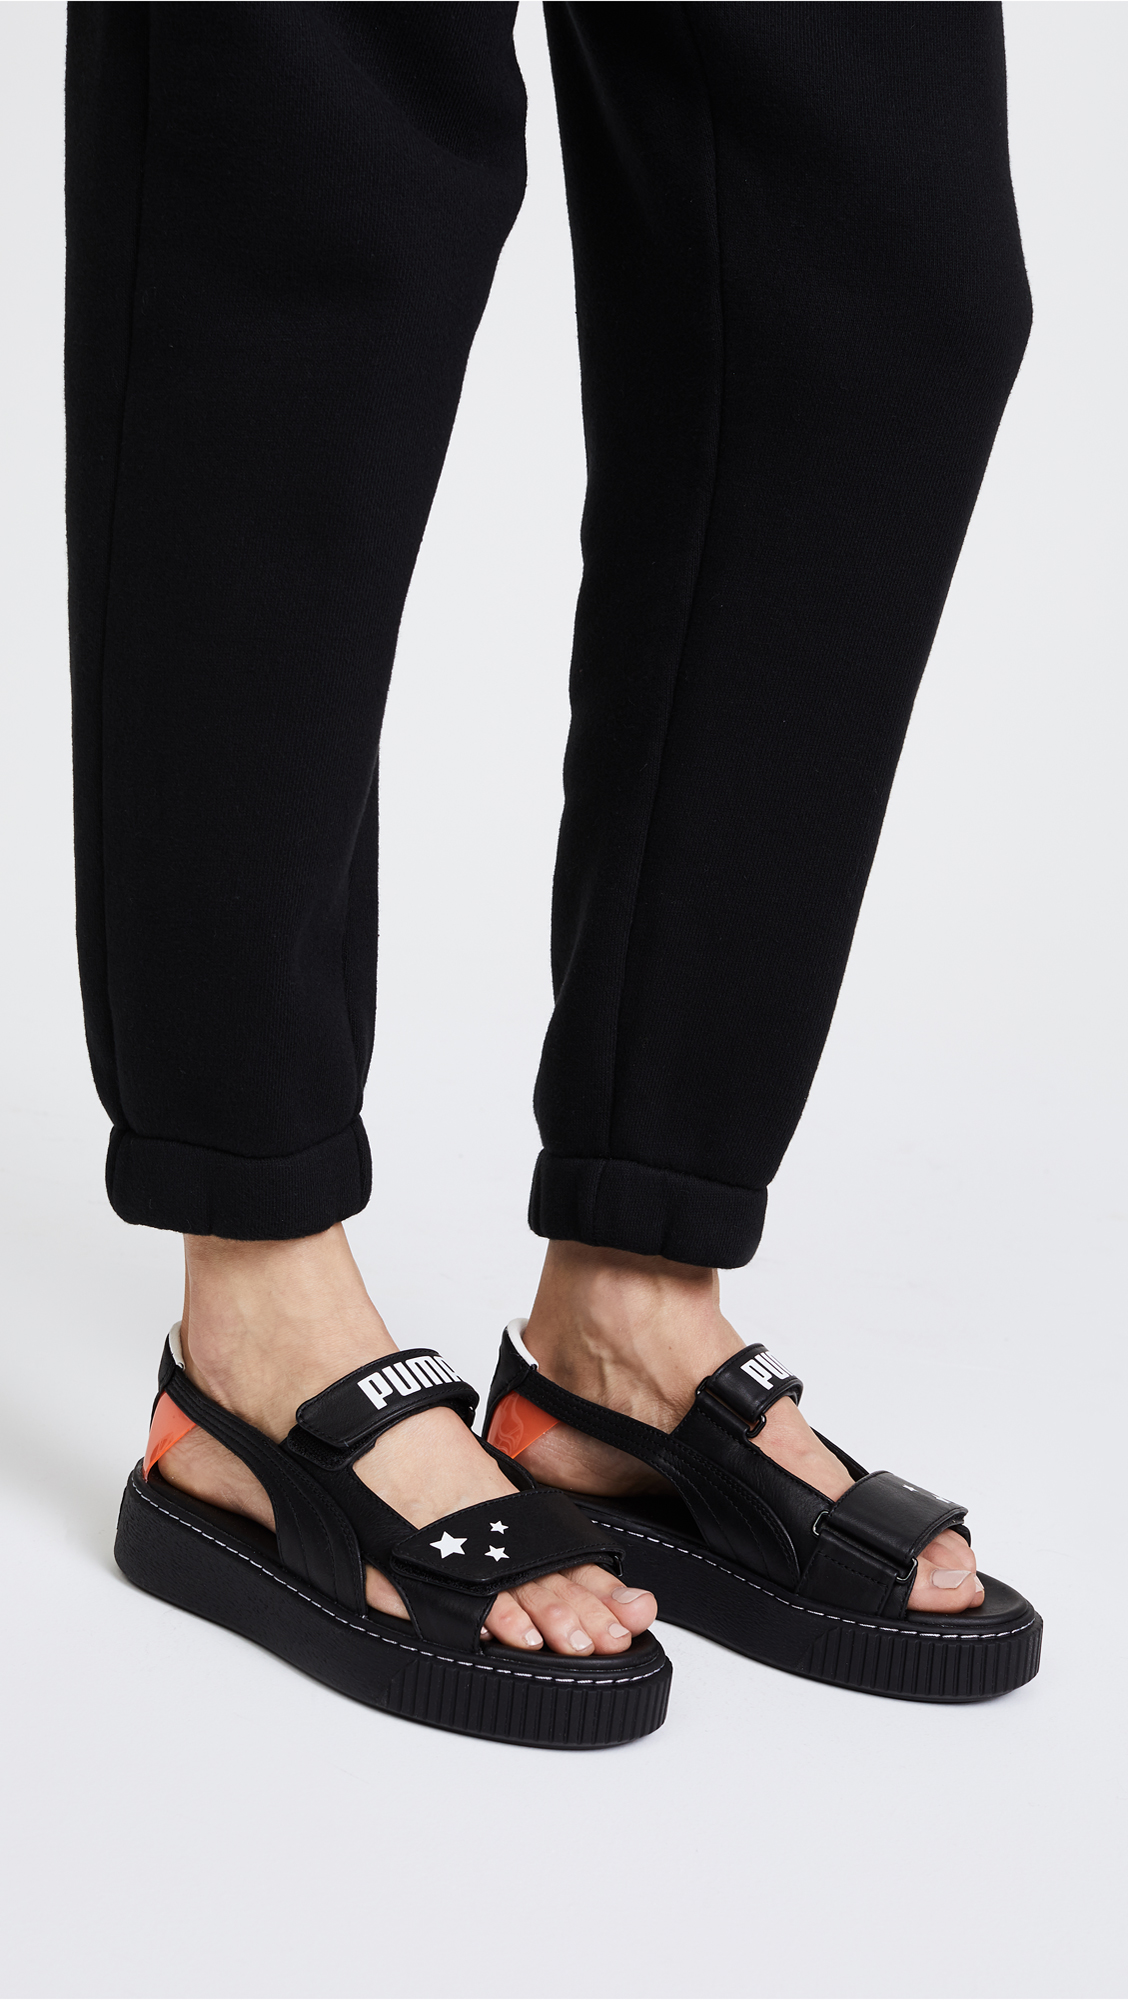 7a16eb91f600 PUMA x SOPHIA WEBSTER Platform Sandals